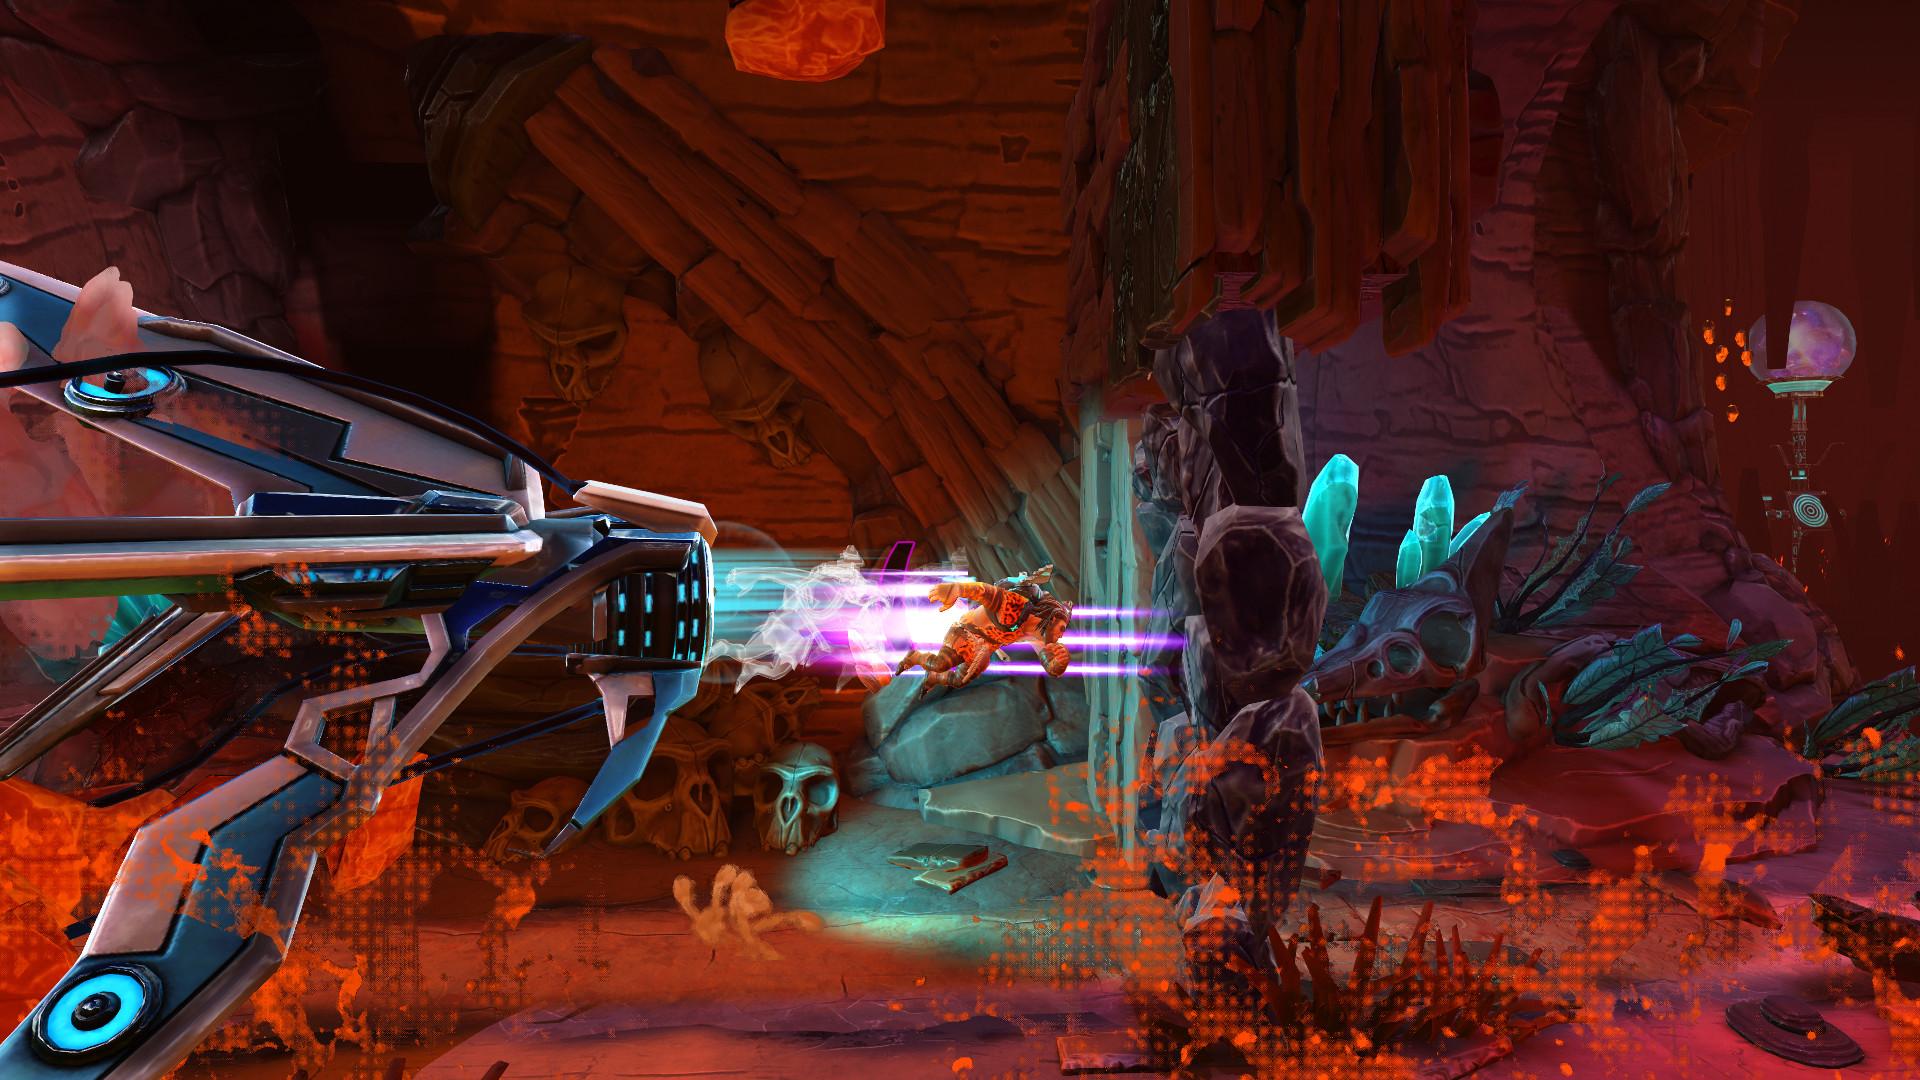 Jet_Kave_Adventure_Screenshot_5.jpg